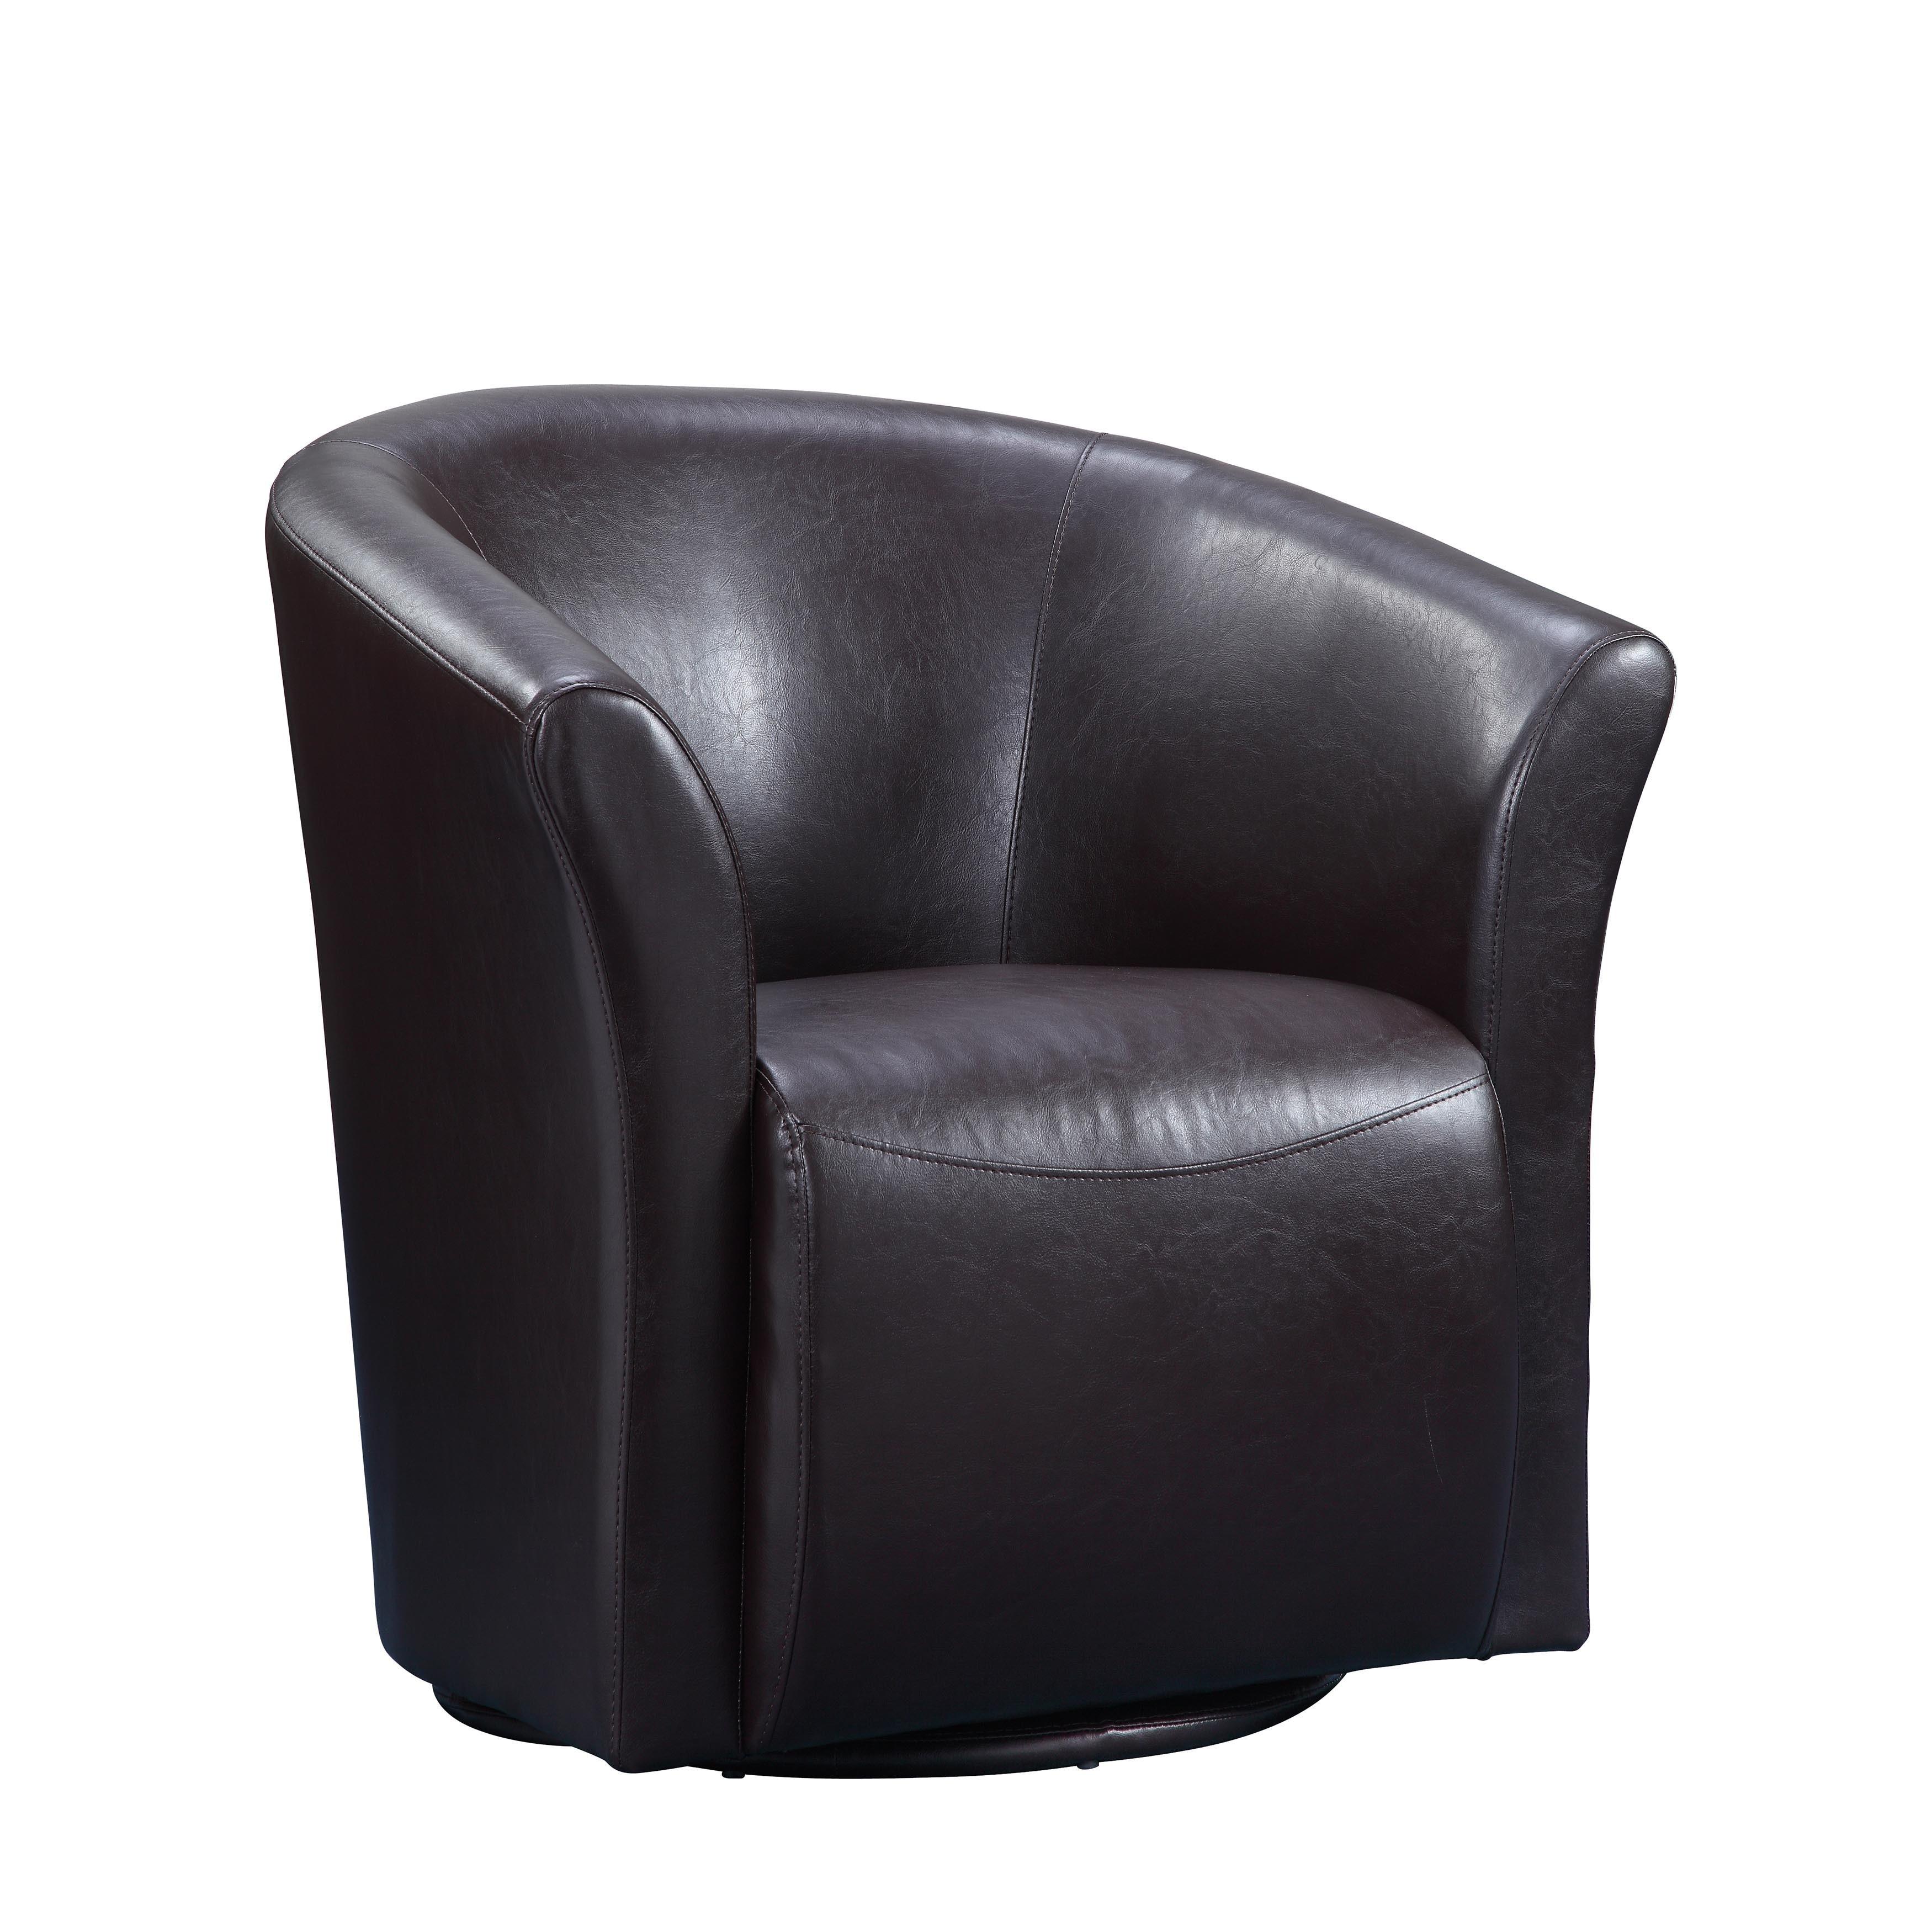 Picket House Radford Swivel Chair Riviera 6273 Brown (Swi...